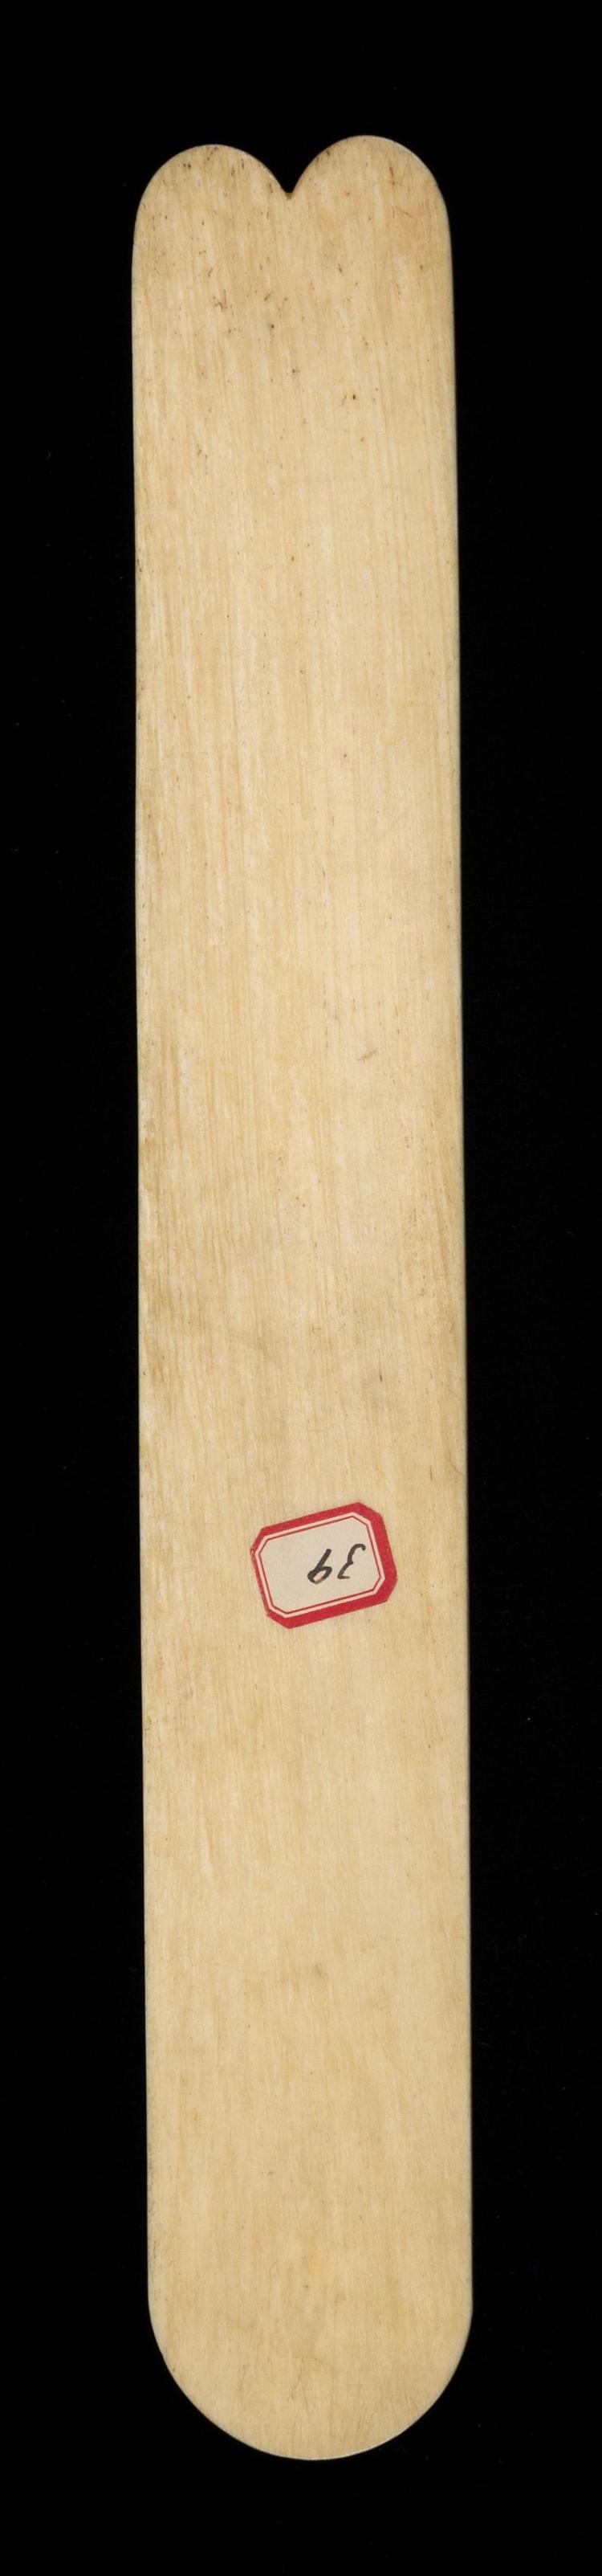 POLYCHROME SCRIMSHAW WHALEBONE BUSK Depicts two hearts, a geometric design, a tree,